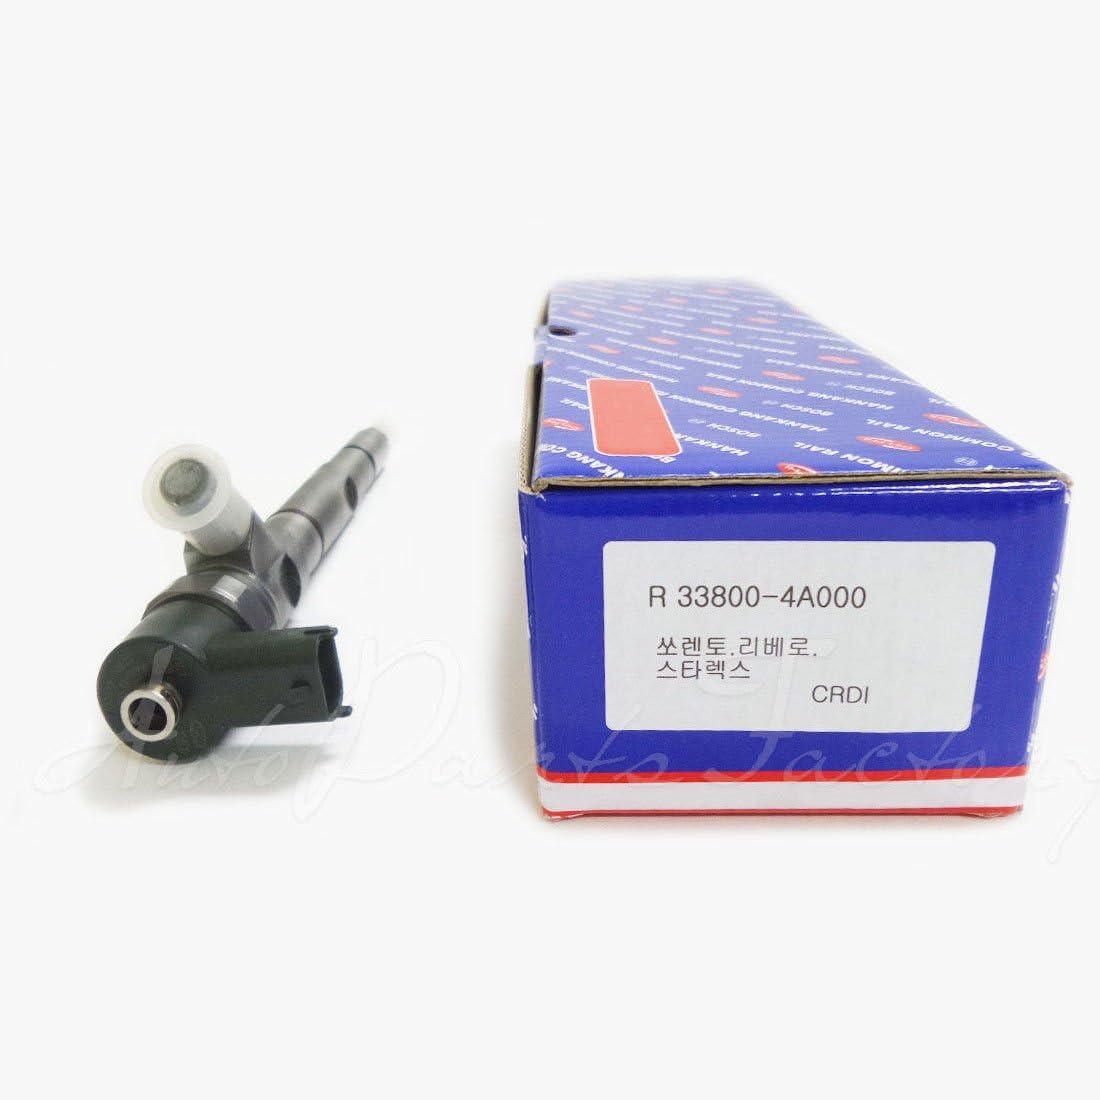 4 pcs set Refurbished Bosch CRDI Diesel Fuel Injector 33800 4A000 for Hyundai Kia Starex Sorento Libero